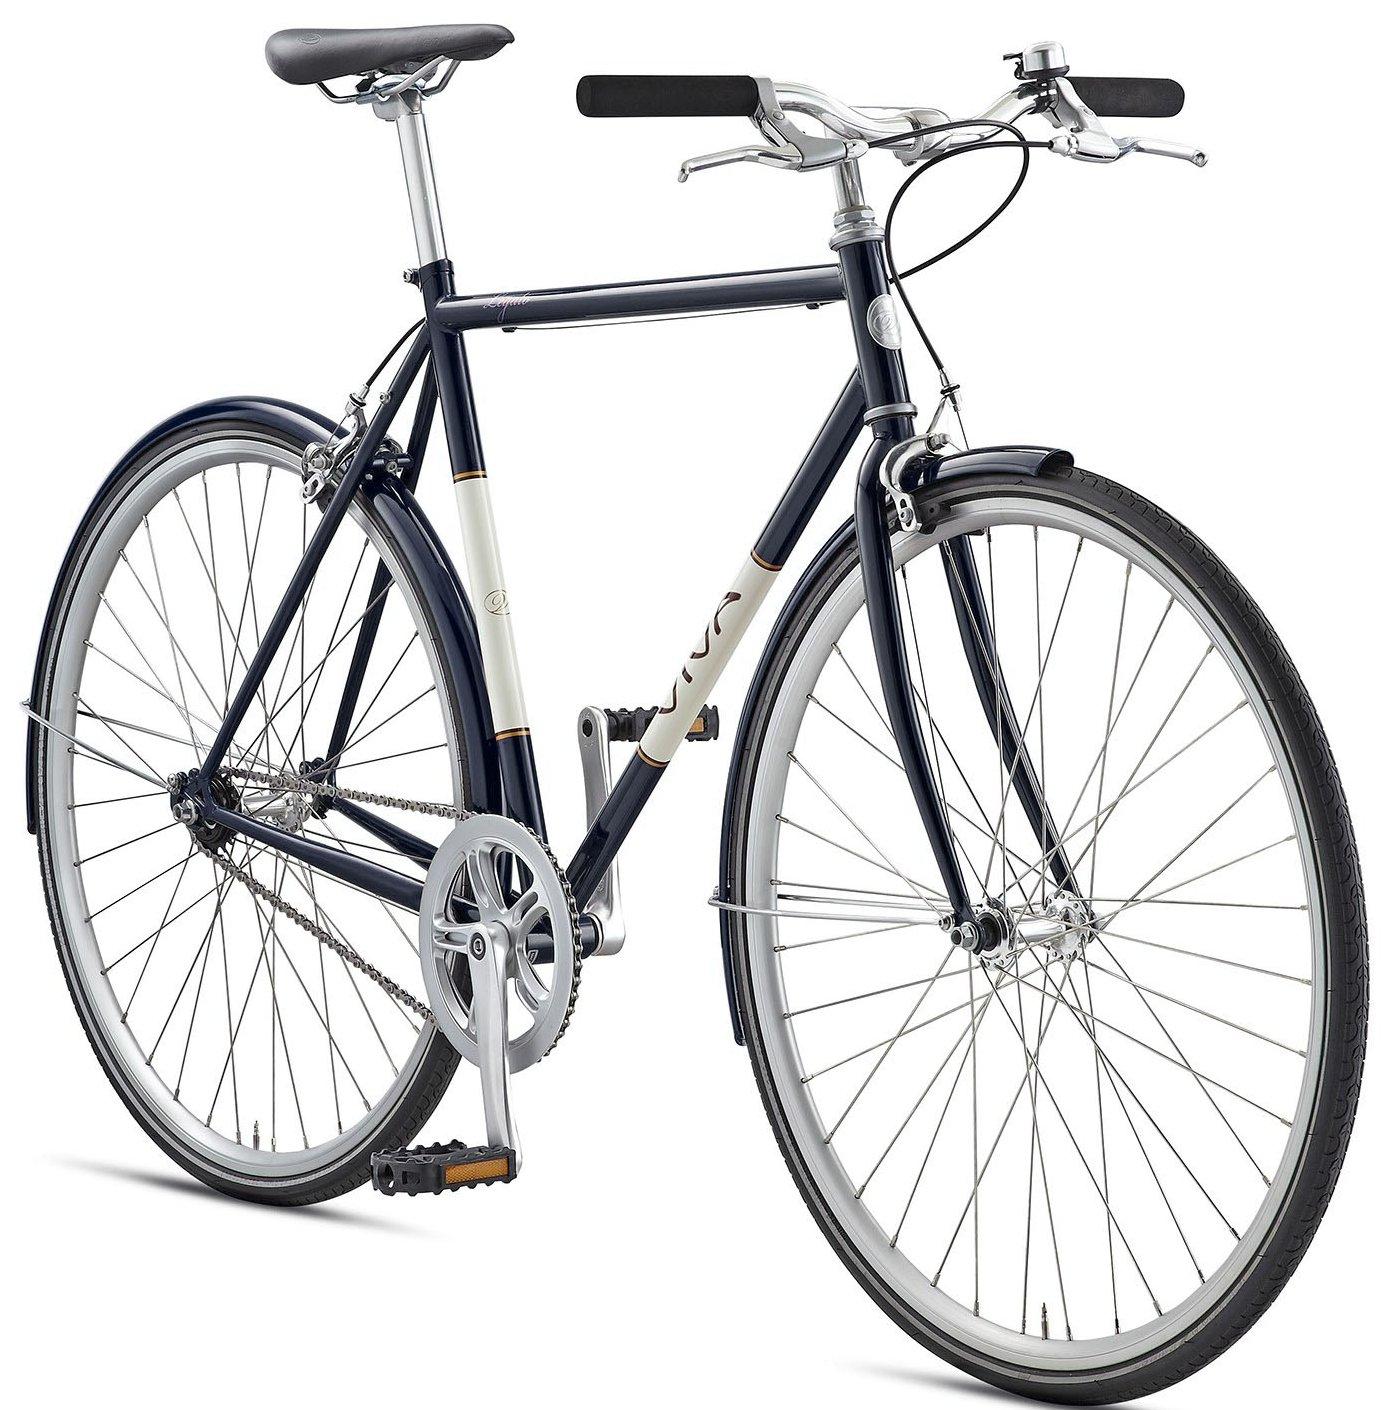 viva legato 1 single speed bicycle. Black Bedroom Furniture Sets. Home Design Ideas